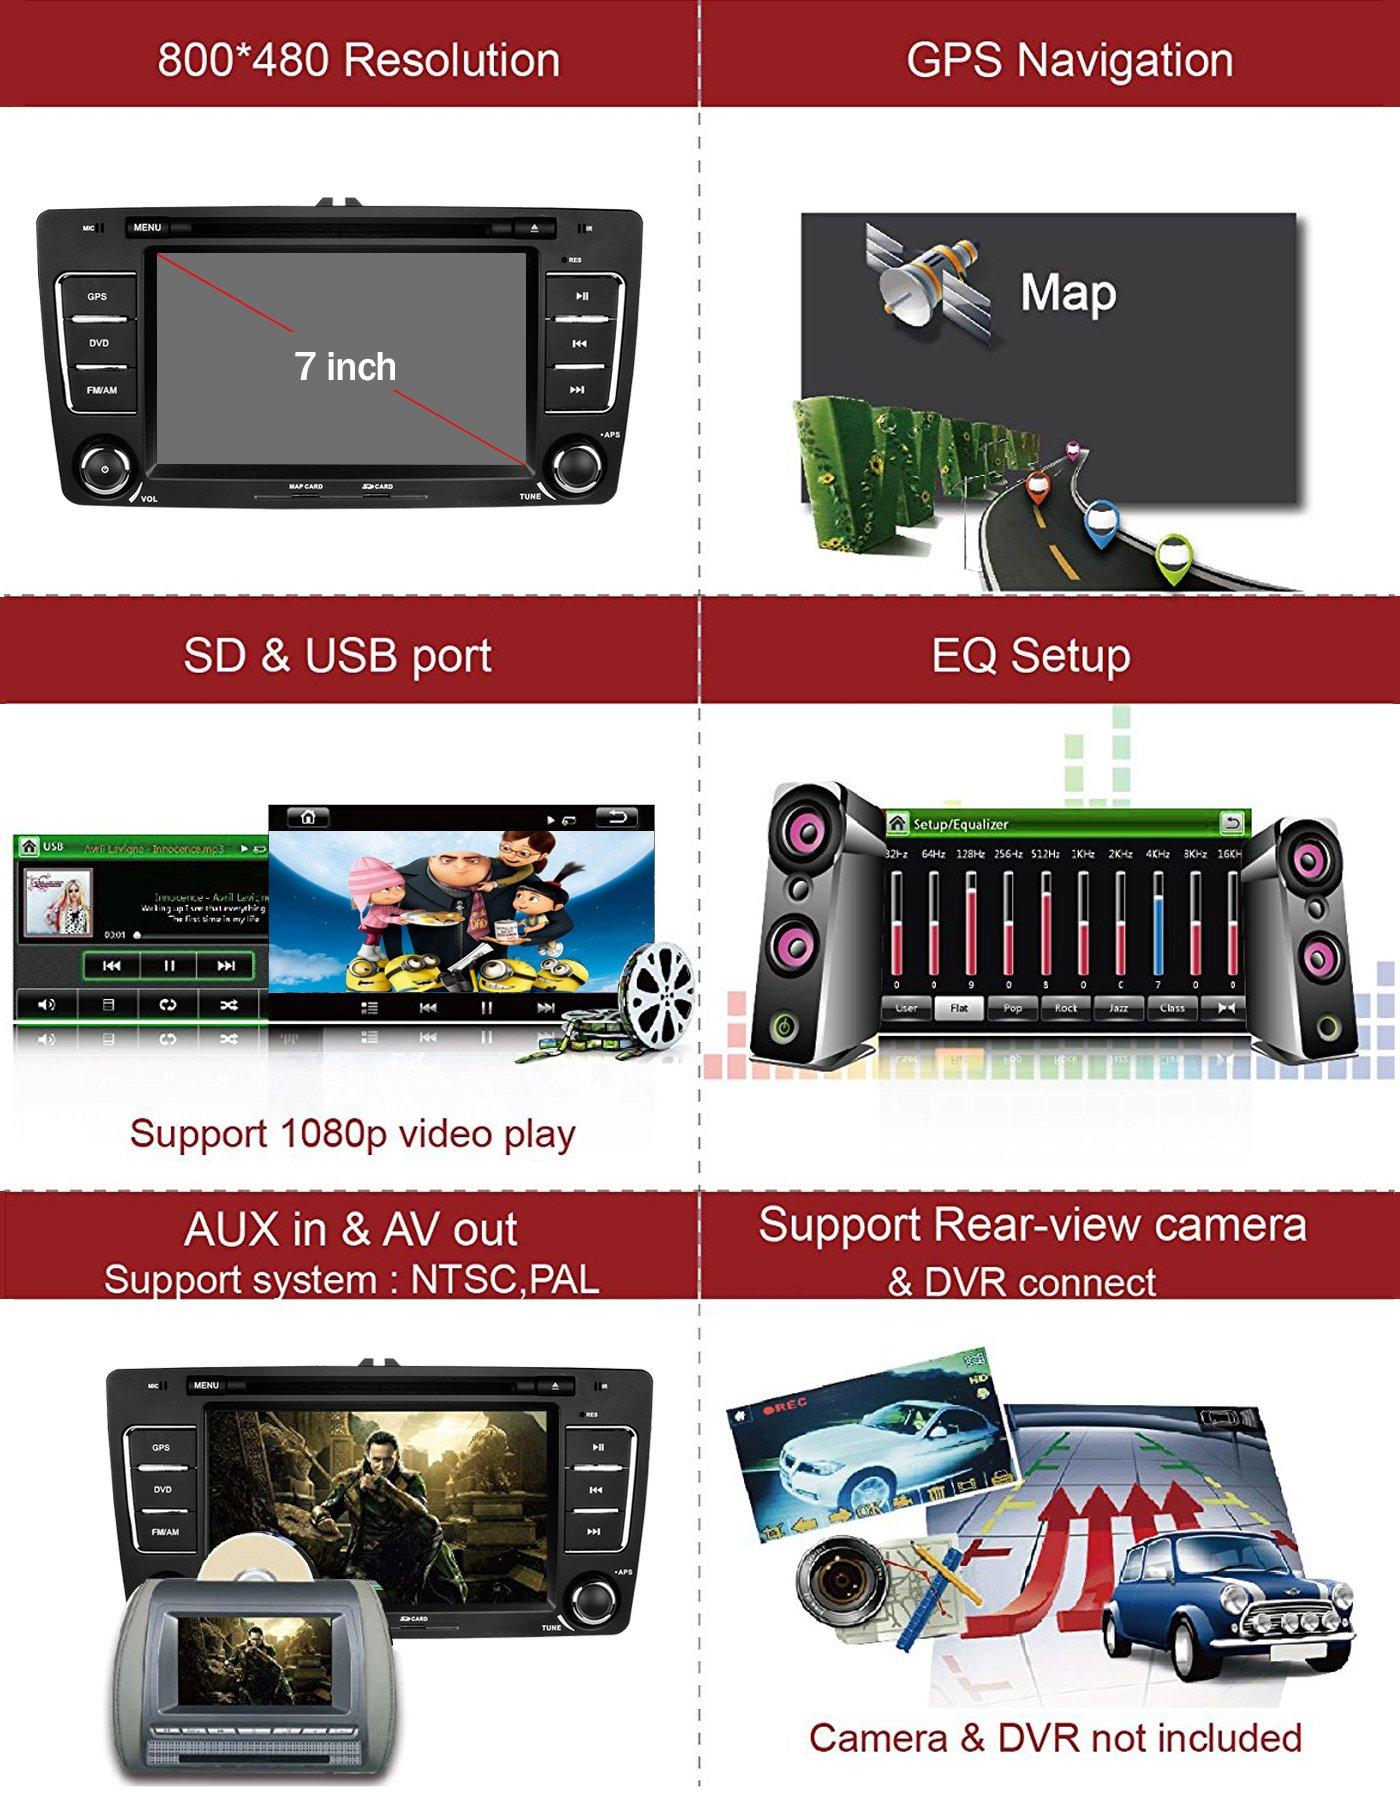 Yingly-7-Zoll-2-Din-Autoradio-fr-Skoda-Octavia-2009-2013-mit-Wince-System-DVD-Player-GPS-Navigation-Radio-Bluetooth-untersttzt-Park-Kamera-Lenkrad-Bedienung-1080P-Video-8GB-Kartenmaterial